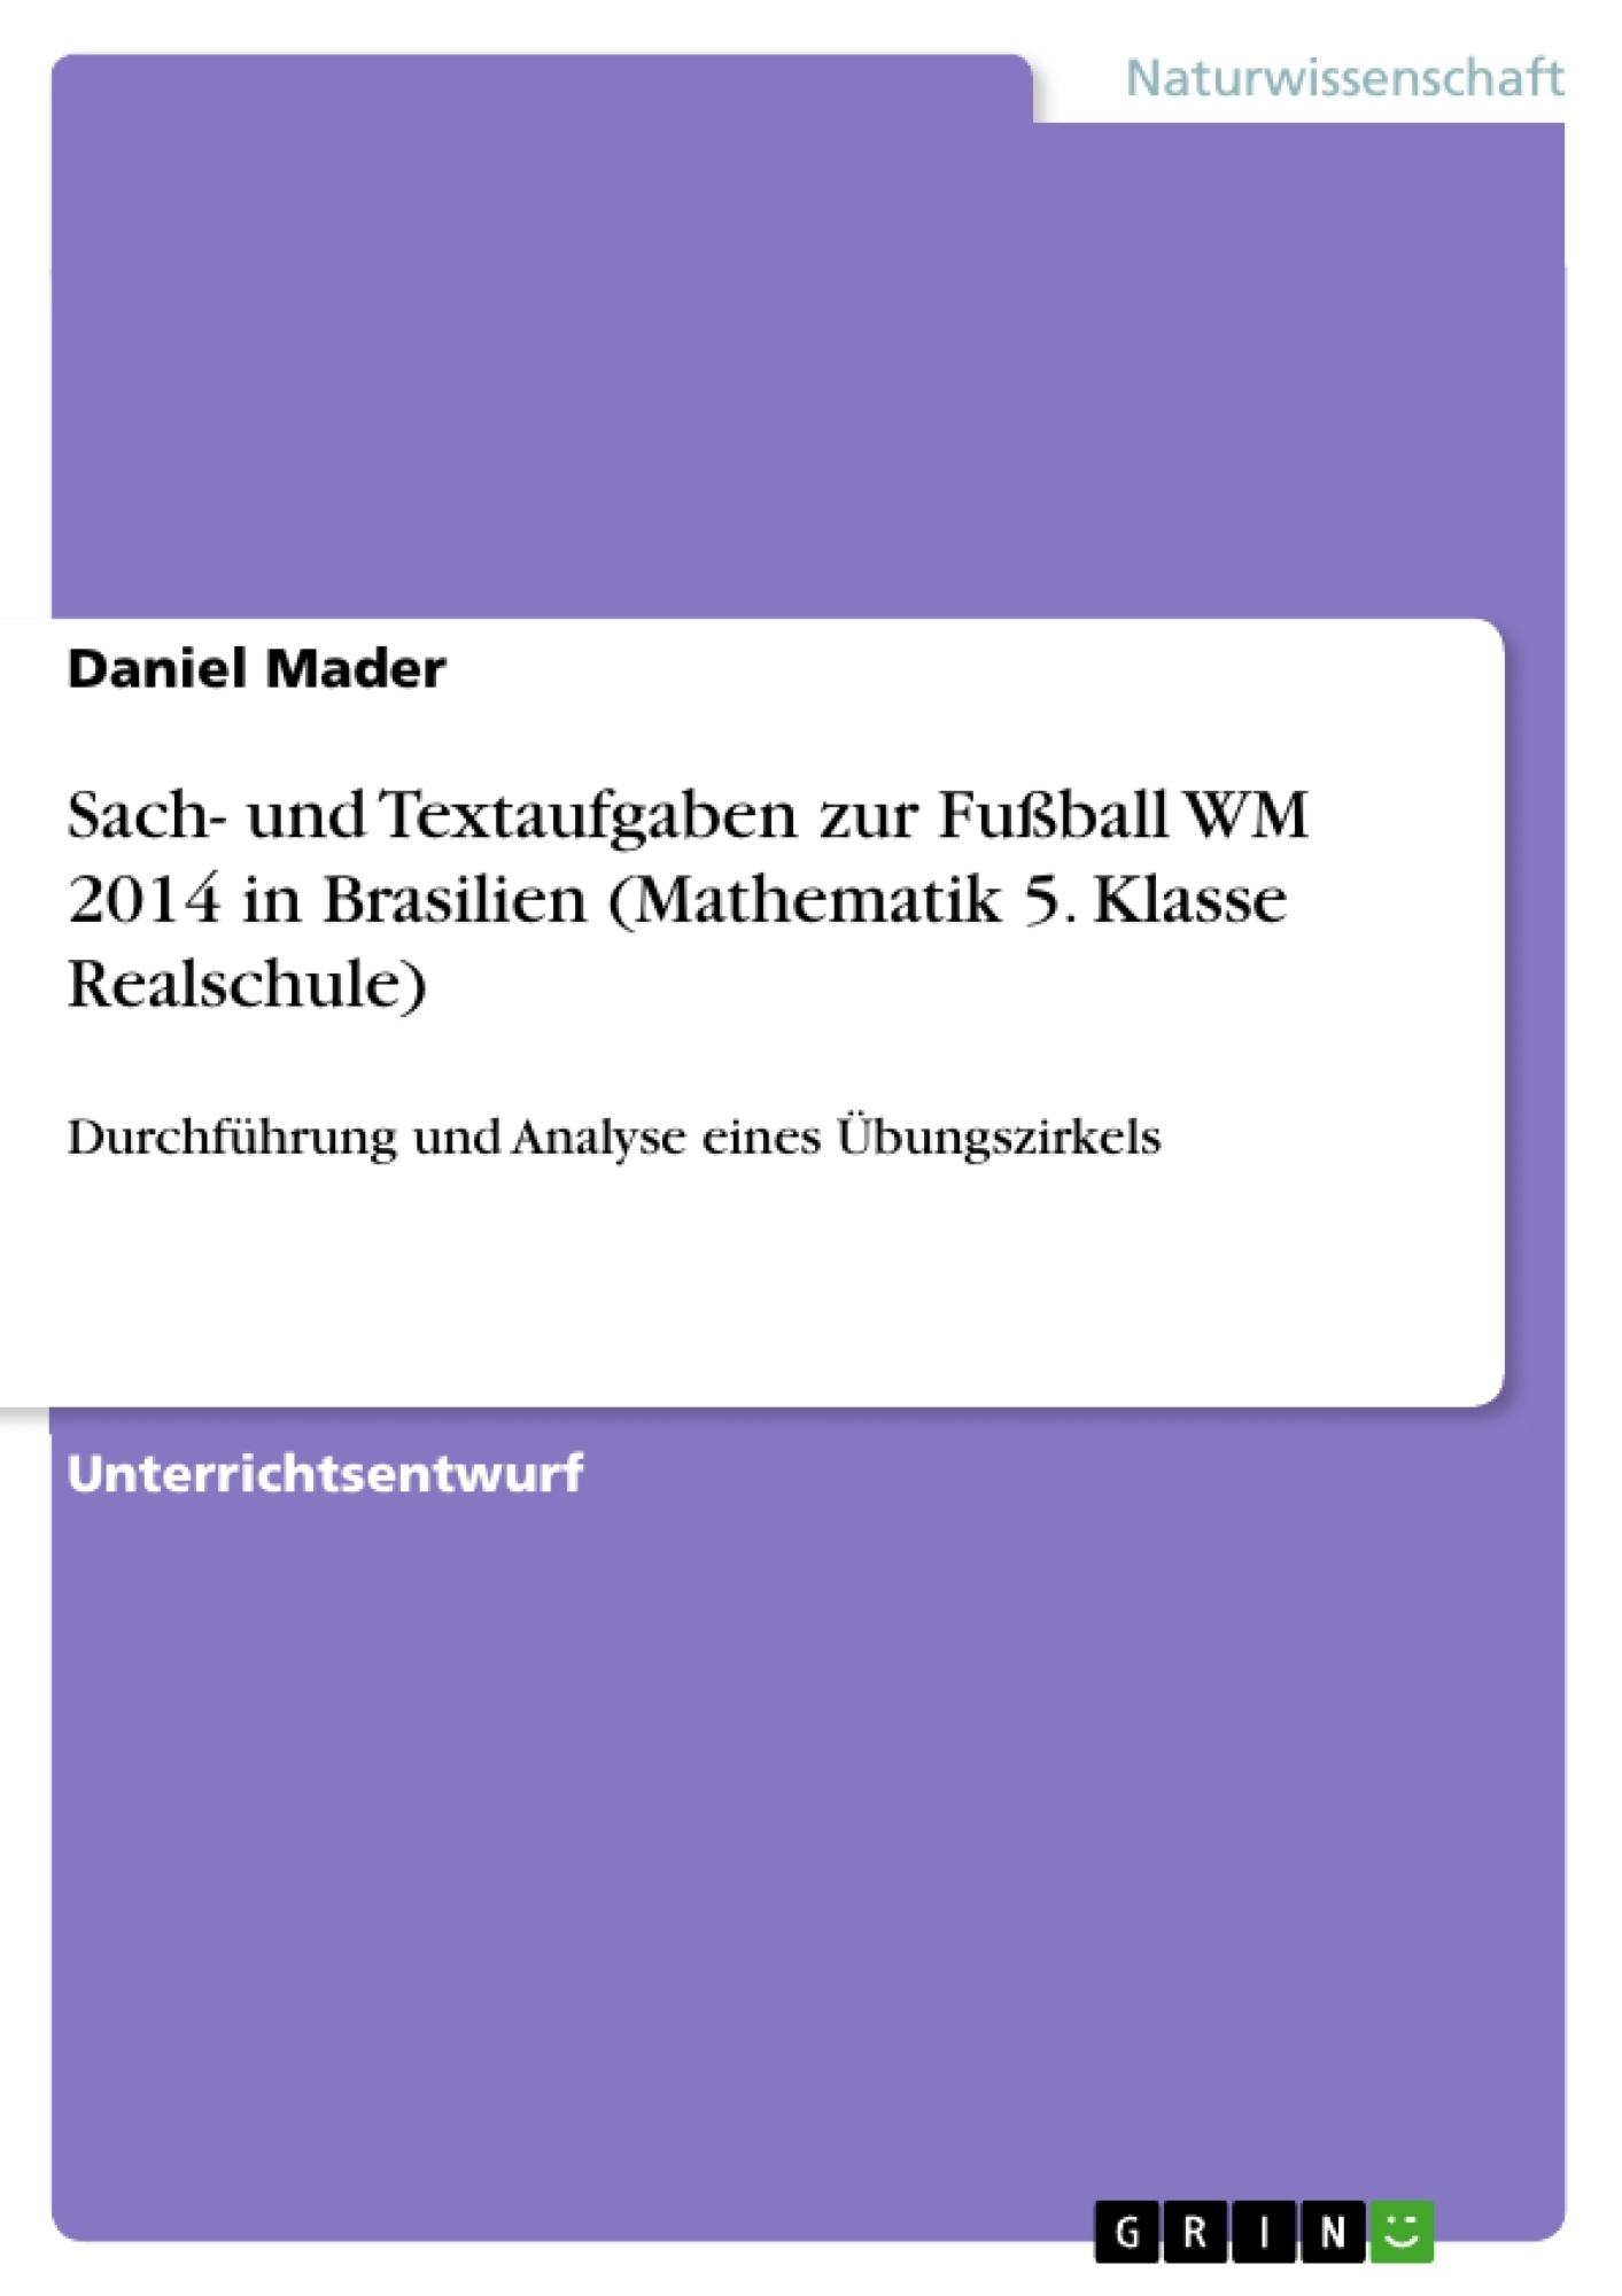 Magnificent Mathe Praxis Einer Tabelle 5Klasse Motif - Mathe ...